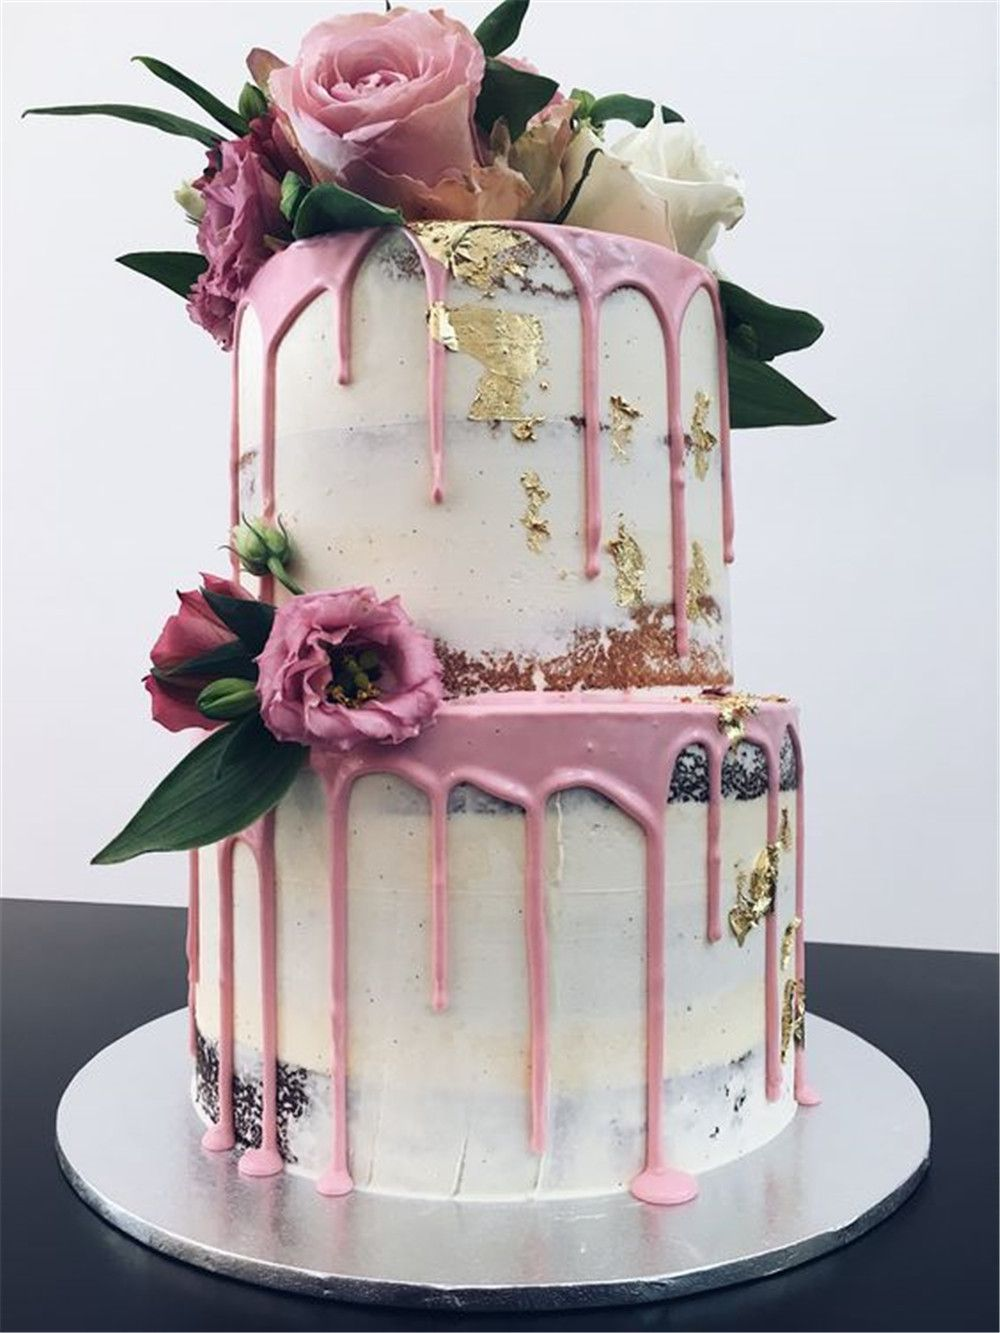 Latest Wedding Cake Trends Melbourne, Naked and Semi Naked